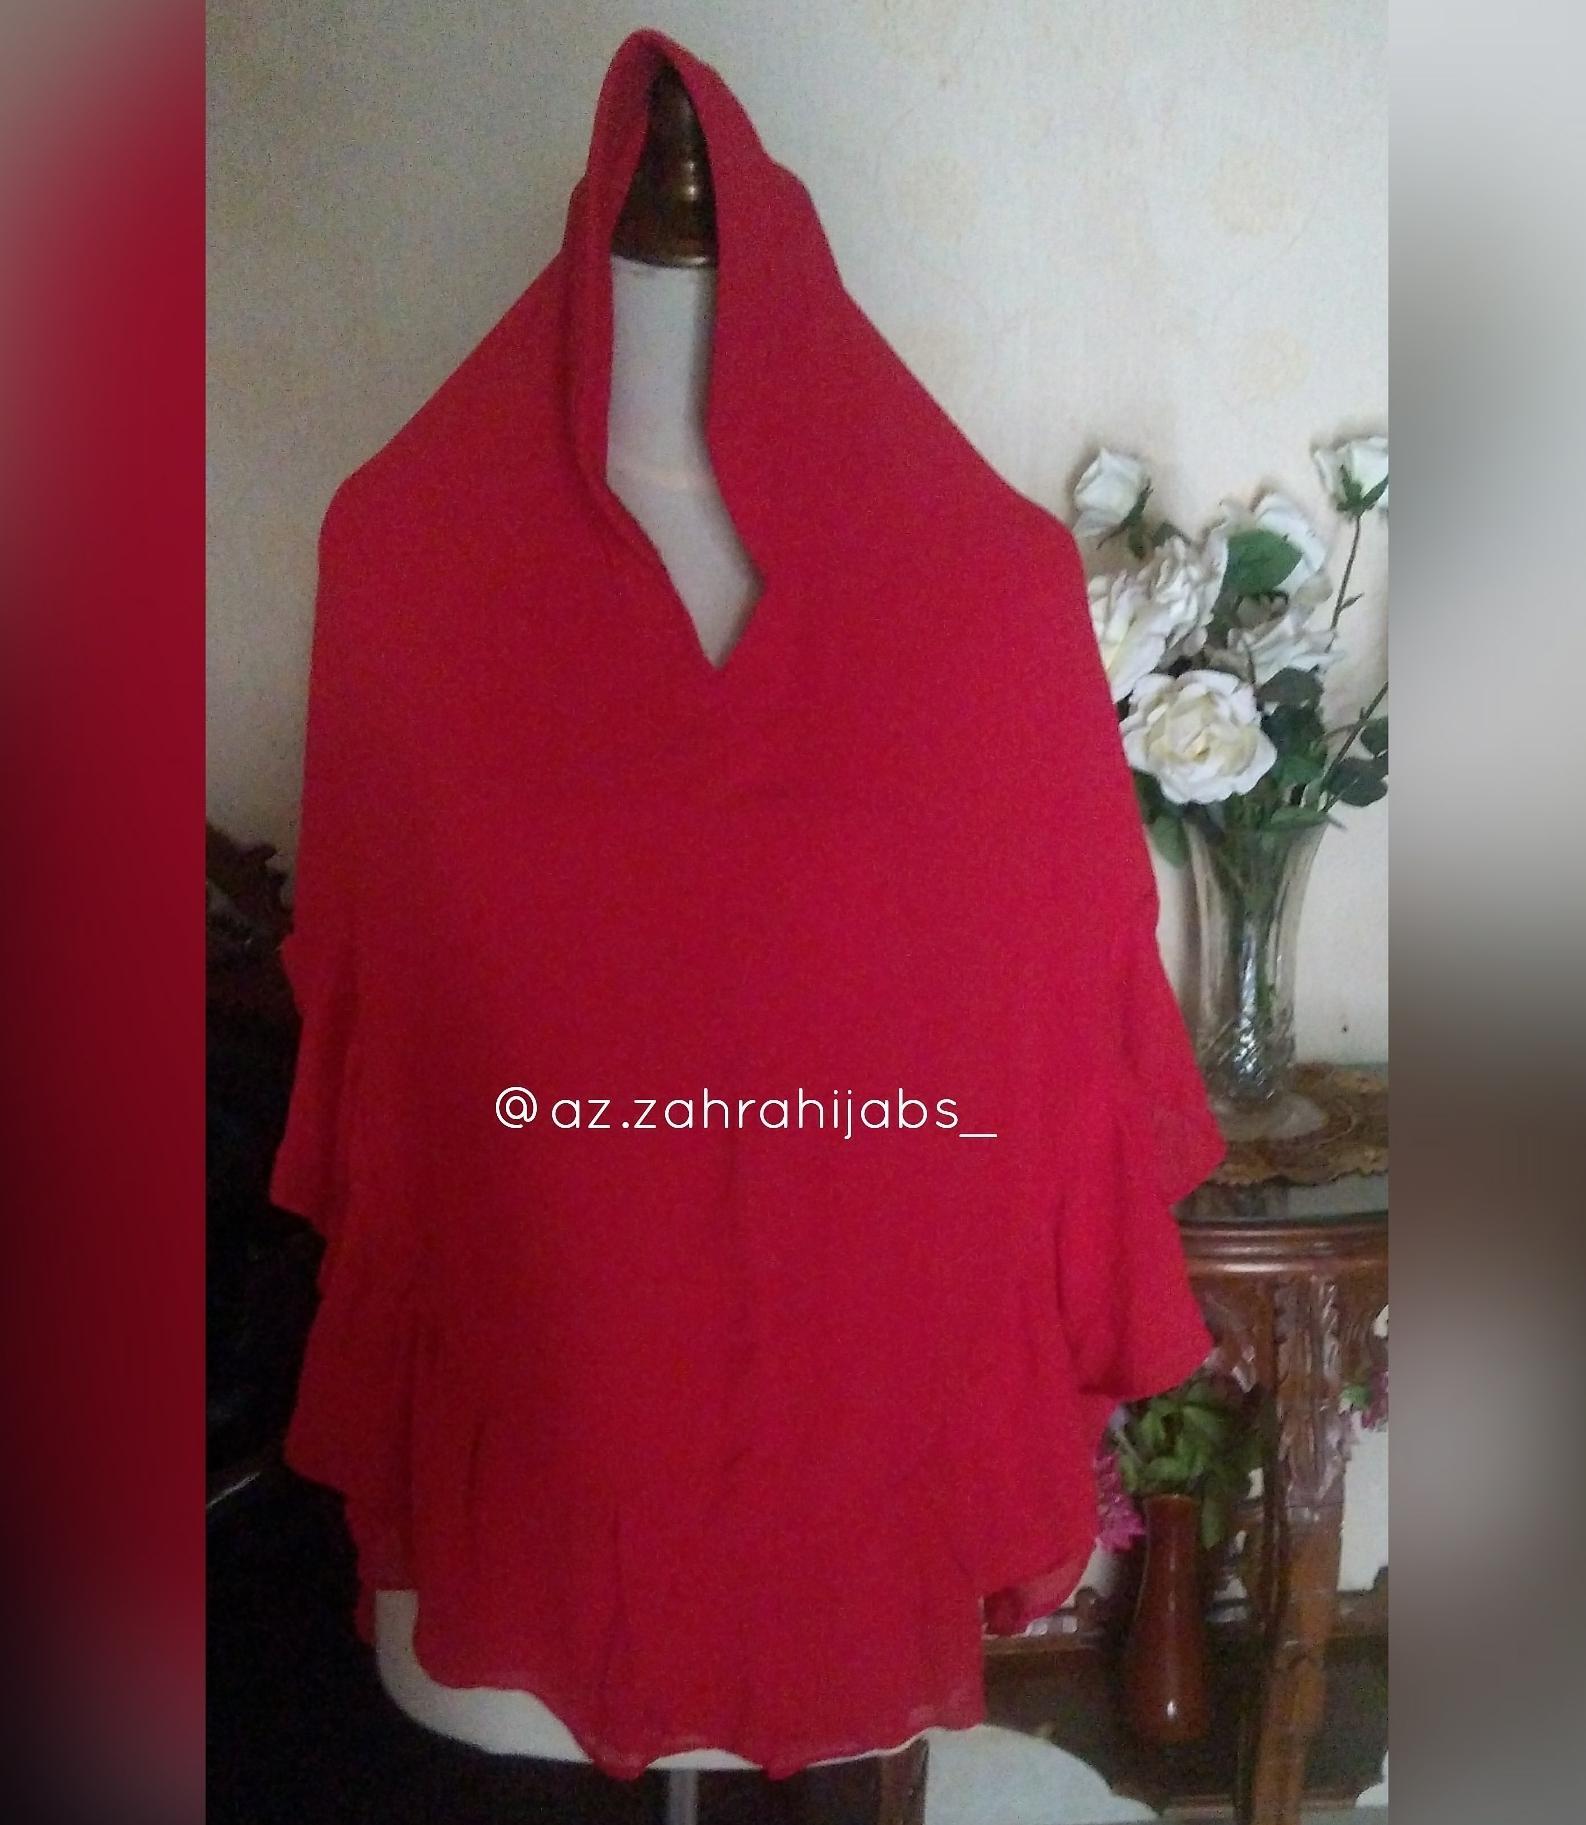 Promo Hijab Jilbab Zara Instan Termurah 2018 Minyak Jafaron Merah Non Alkohol Biang Bibit Asli Murni 3ml Model Botol Tutup Colekasli Buktikan Daftar Harga Bayi September Cari Dan Syari 2 Layer Bahan